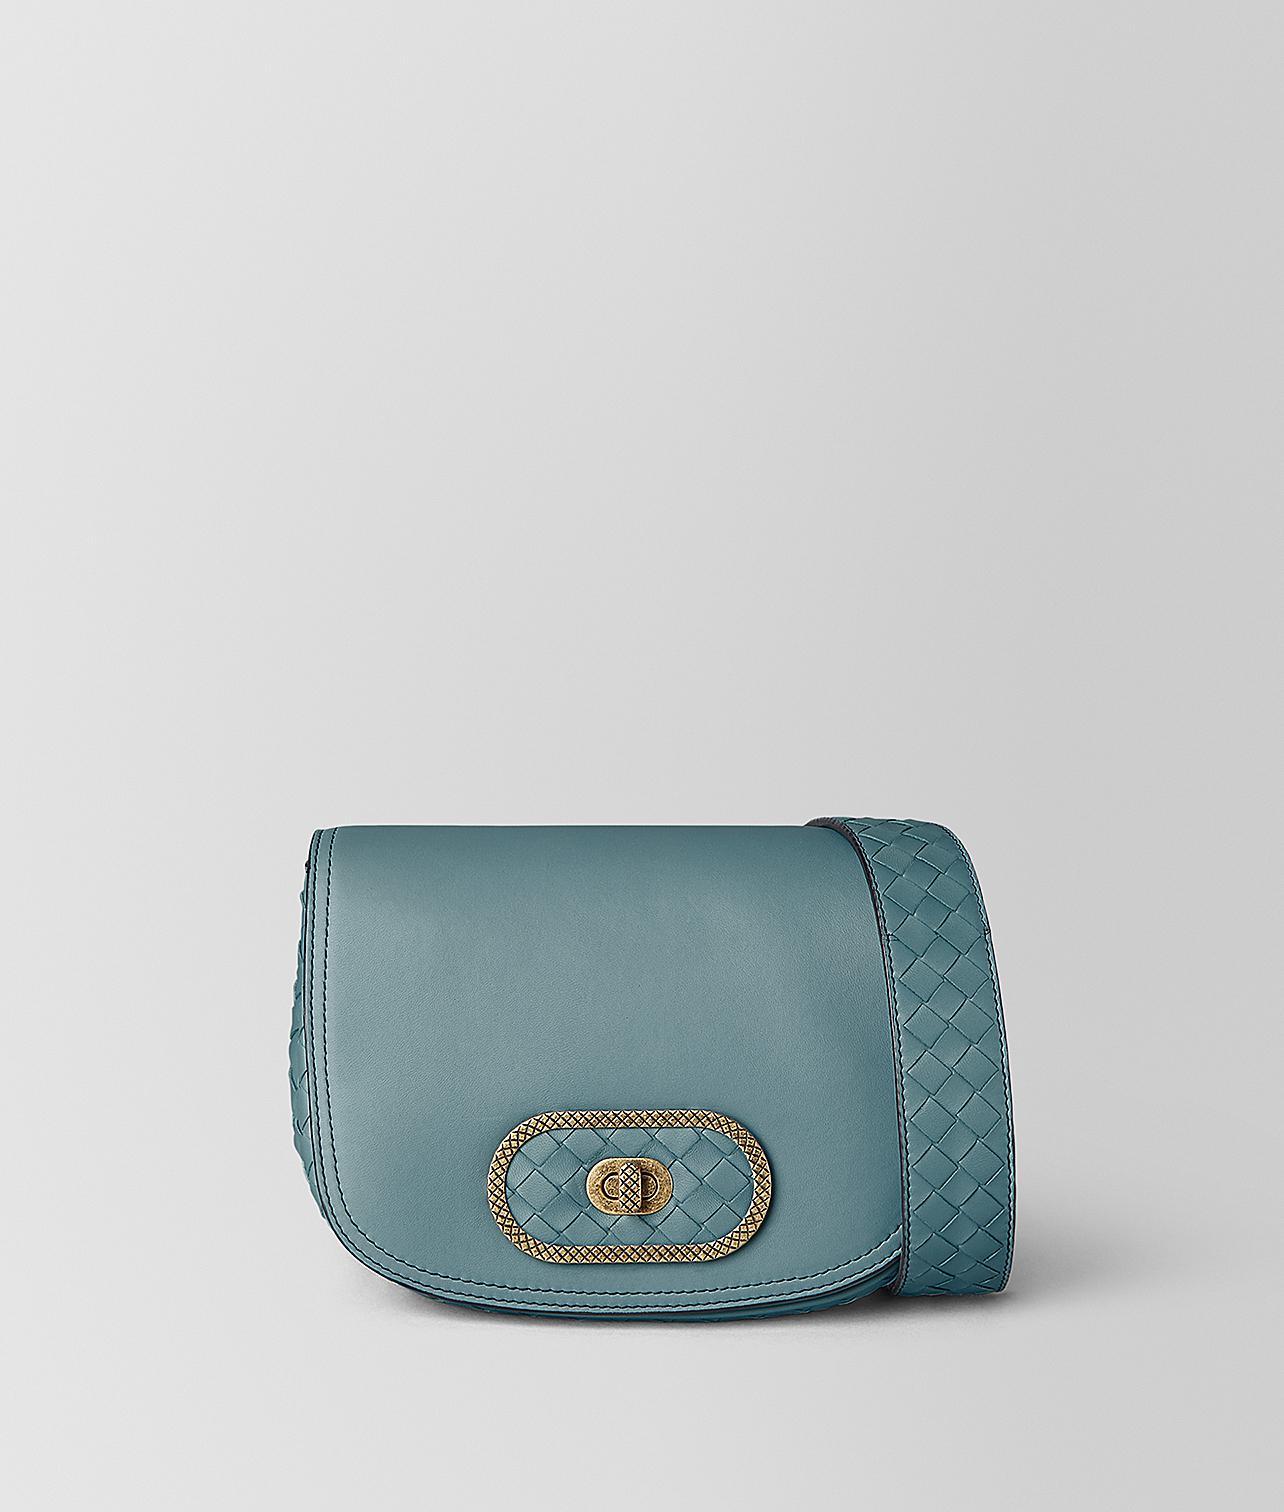 03732192b1b Bottega Veneta Bv Luna Bag In Nappa - Lyst